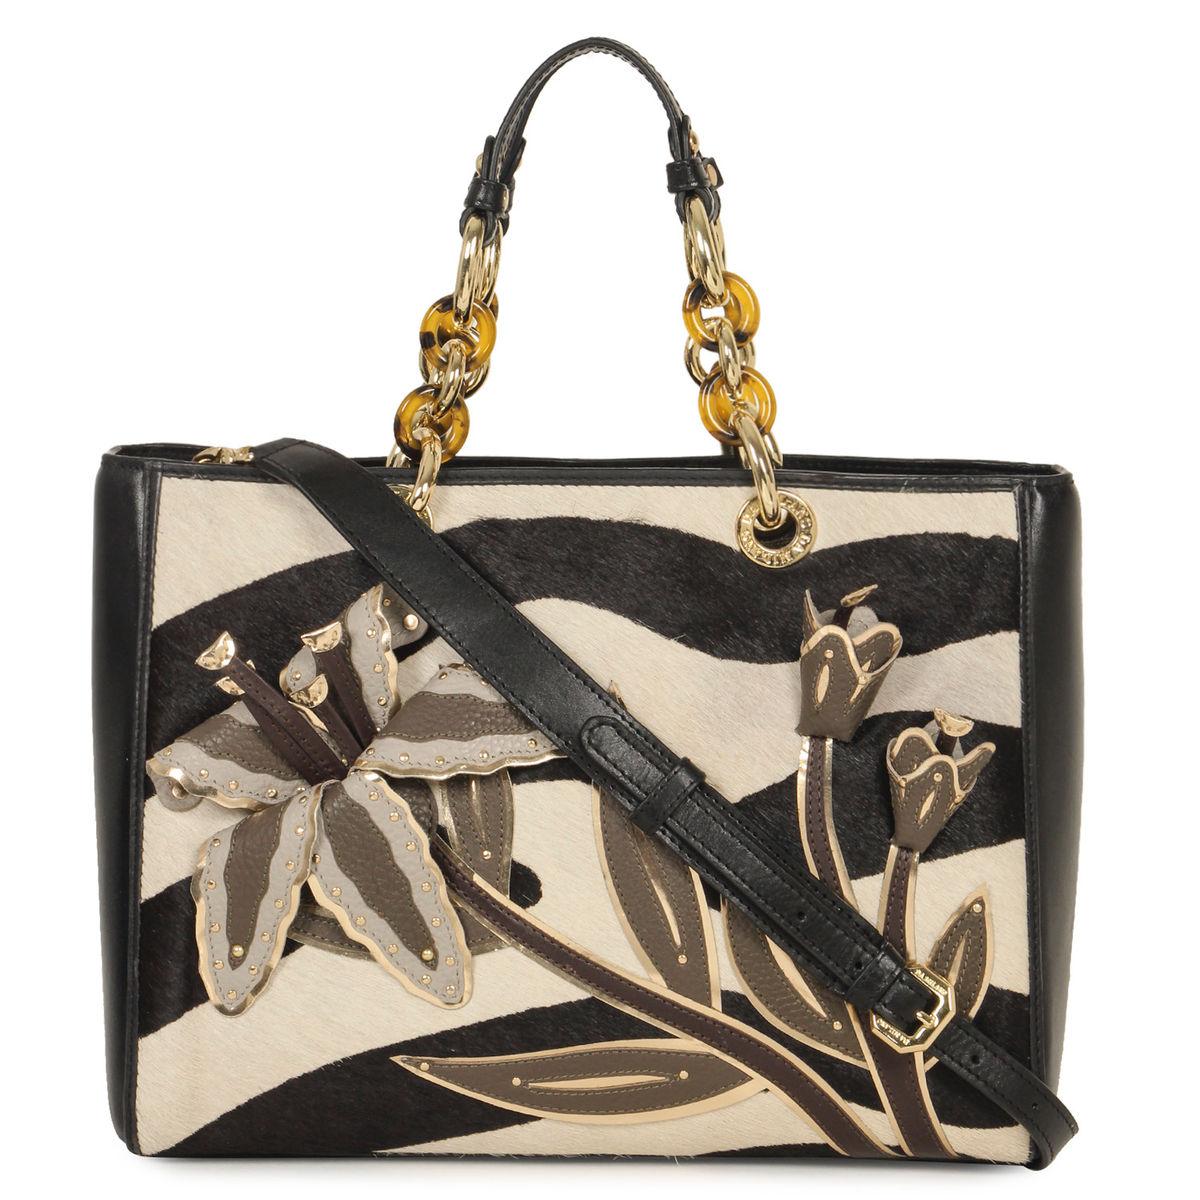 3c4448b979 Da Milano Black White Top Handle Bag